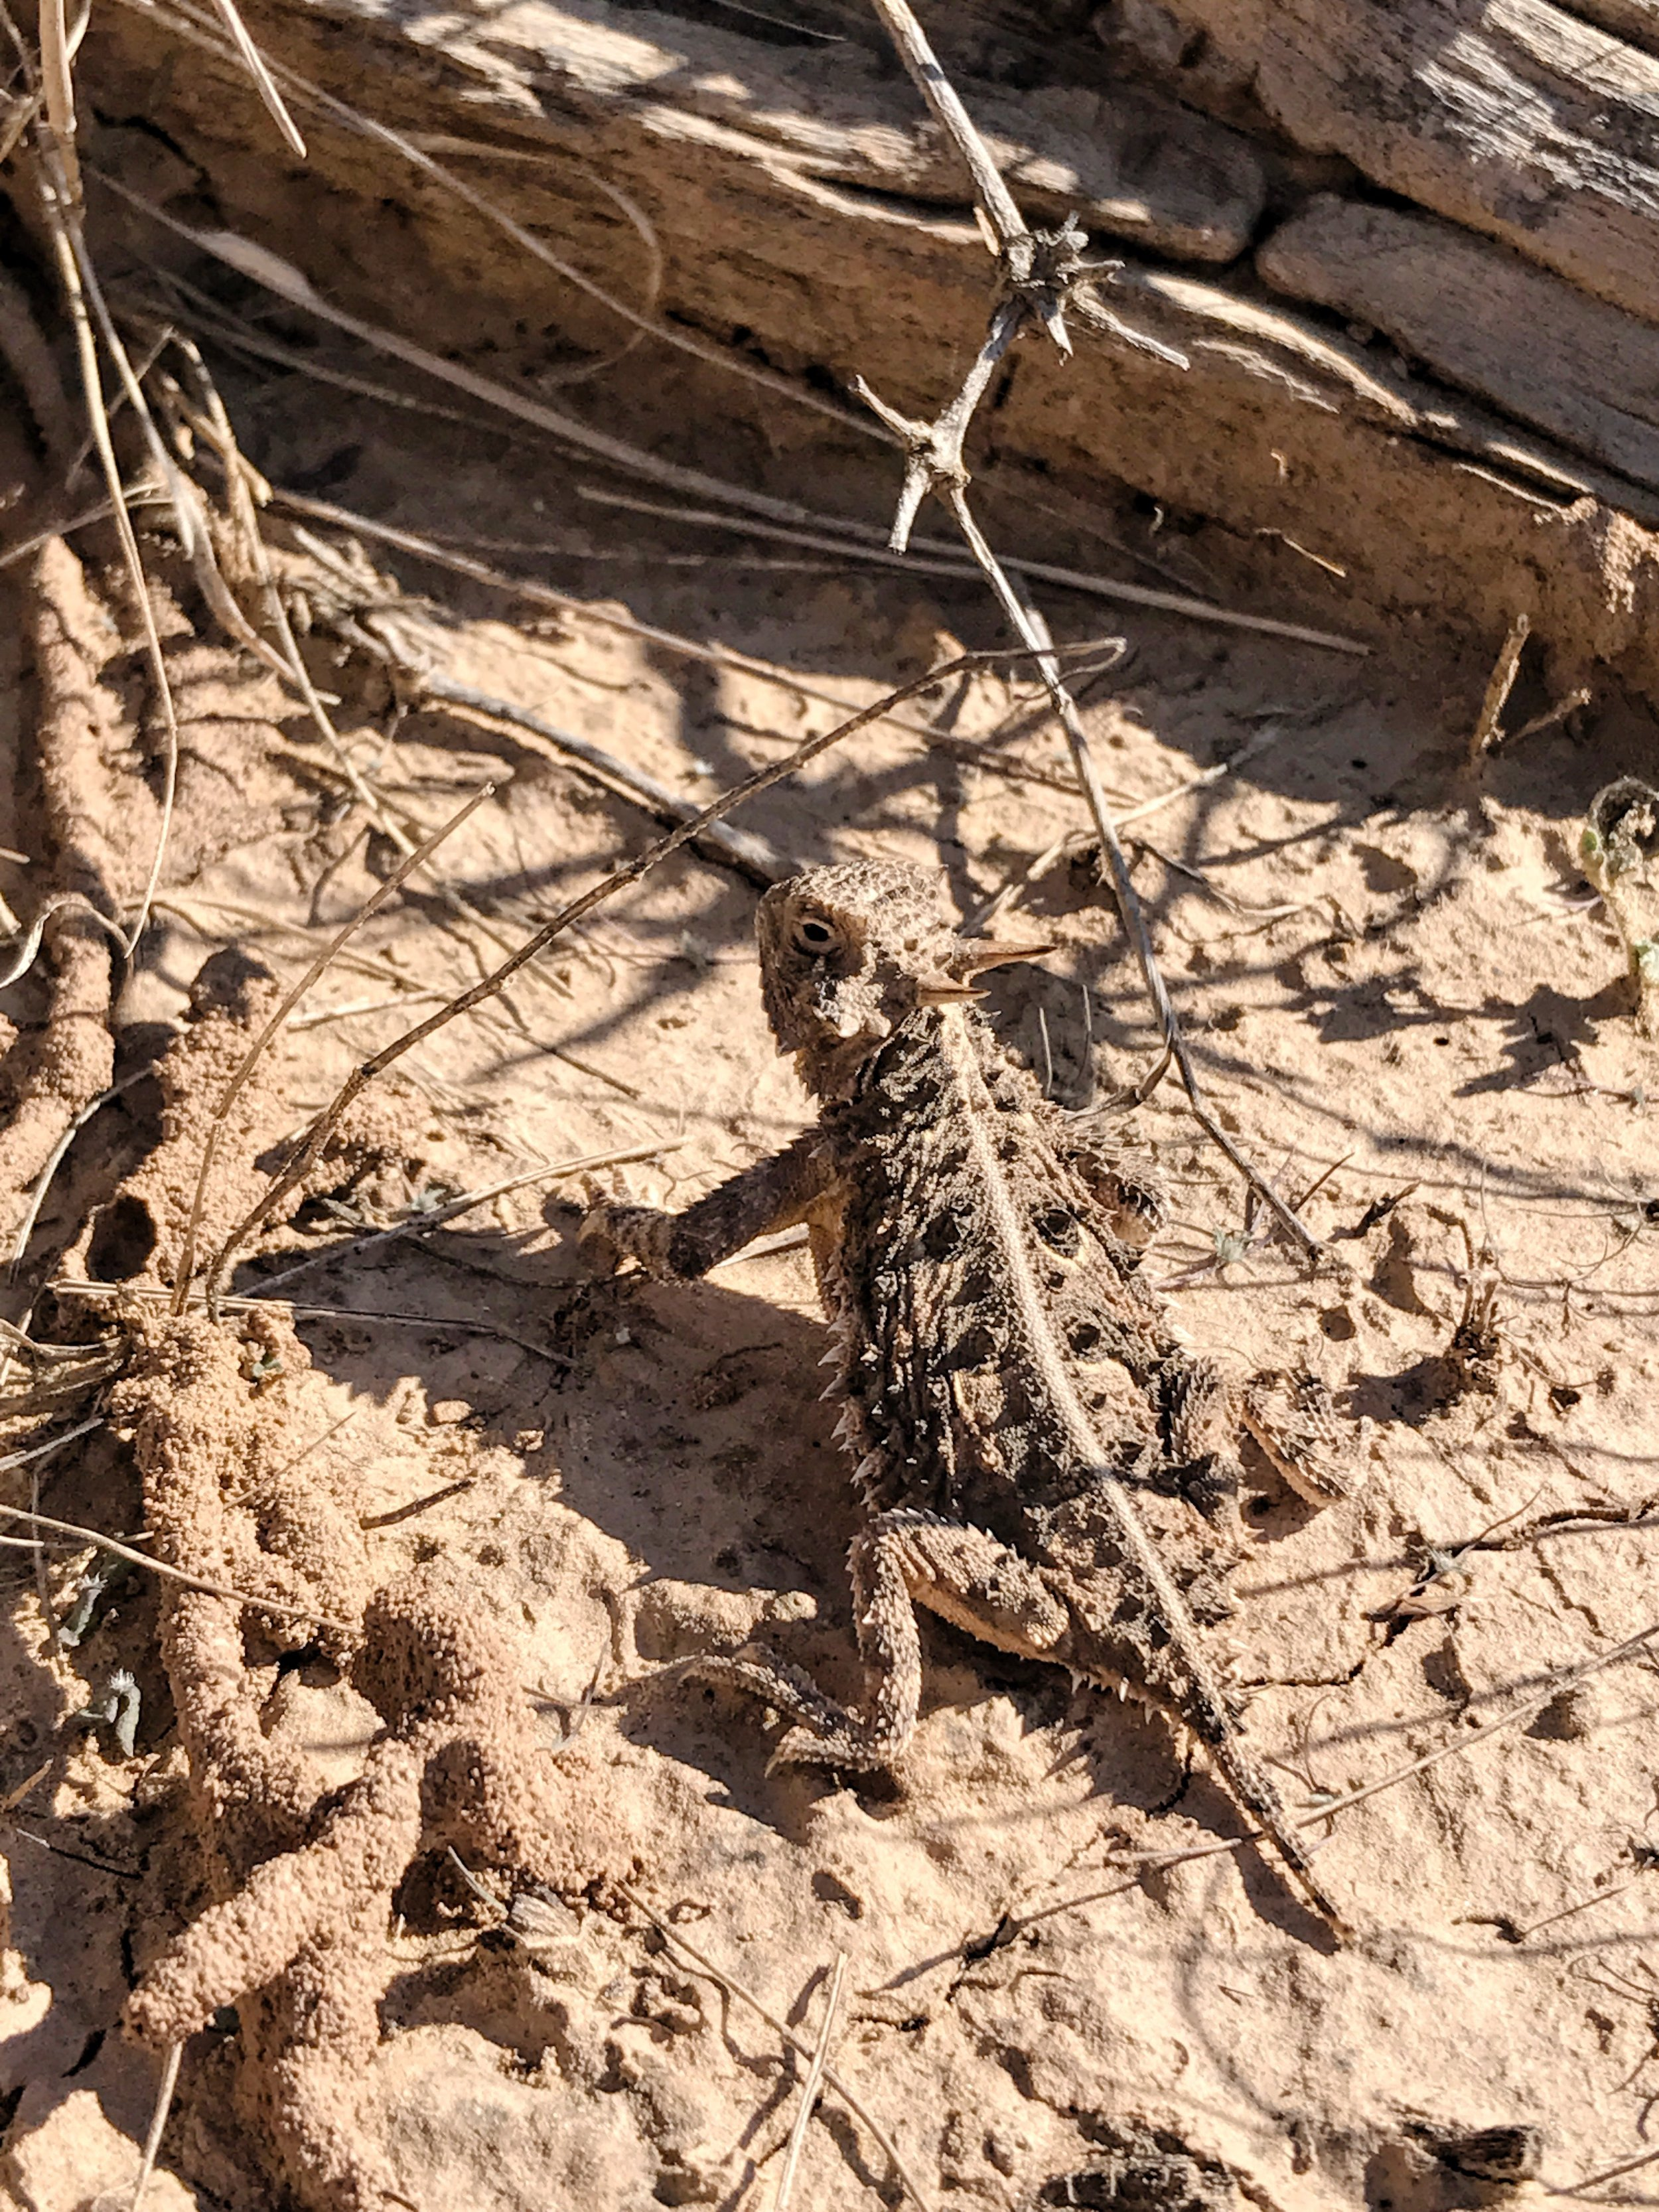 Phrynosoma cornutum, Texas Horned Lizard